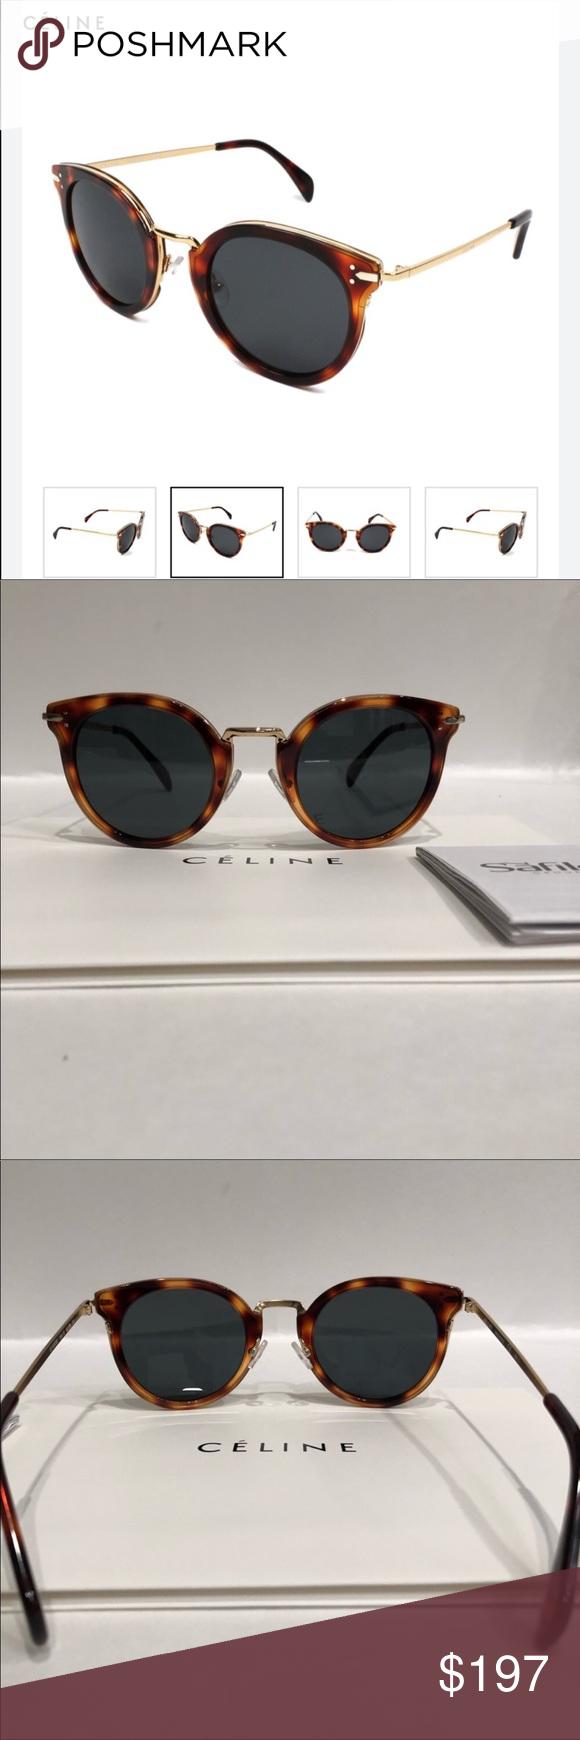 fe6e0c137ce Spotted while shopping on Poshmark  Celine sunglasses 👓!  poshmark   fashion  shopping